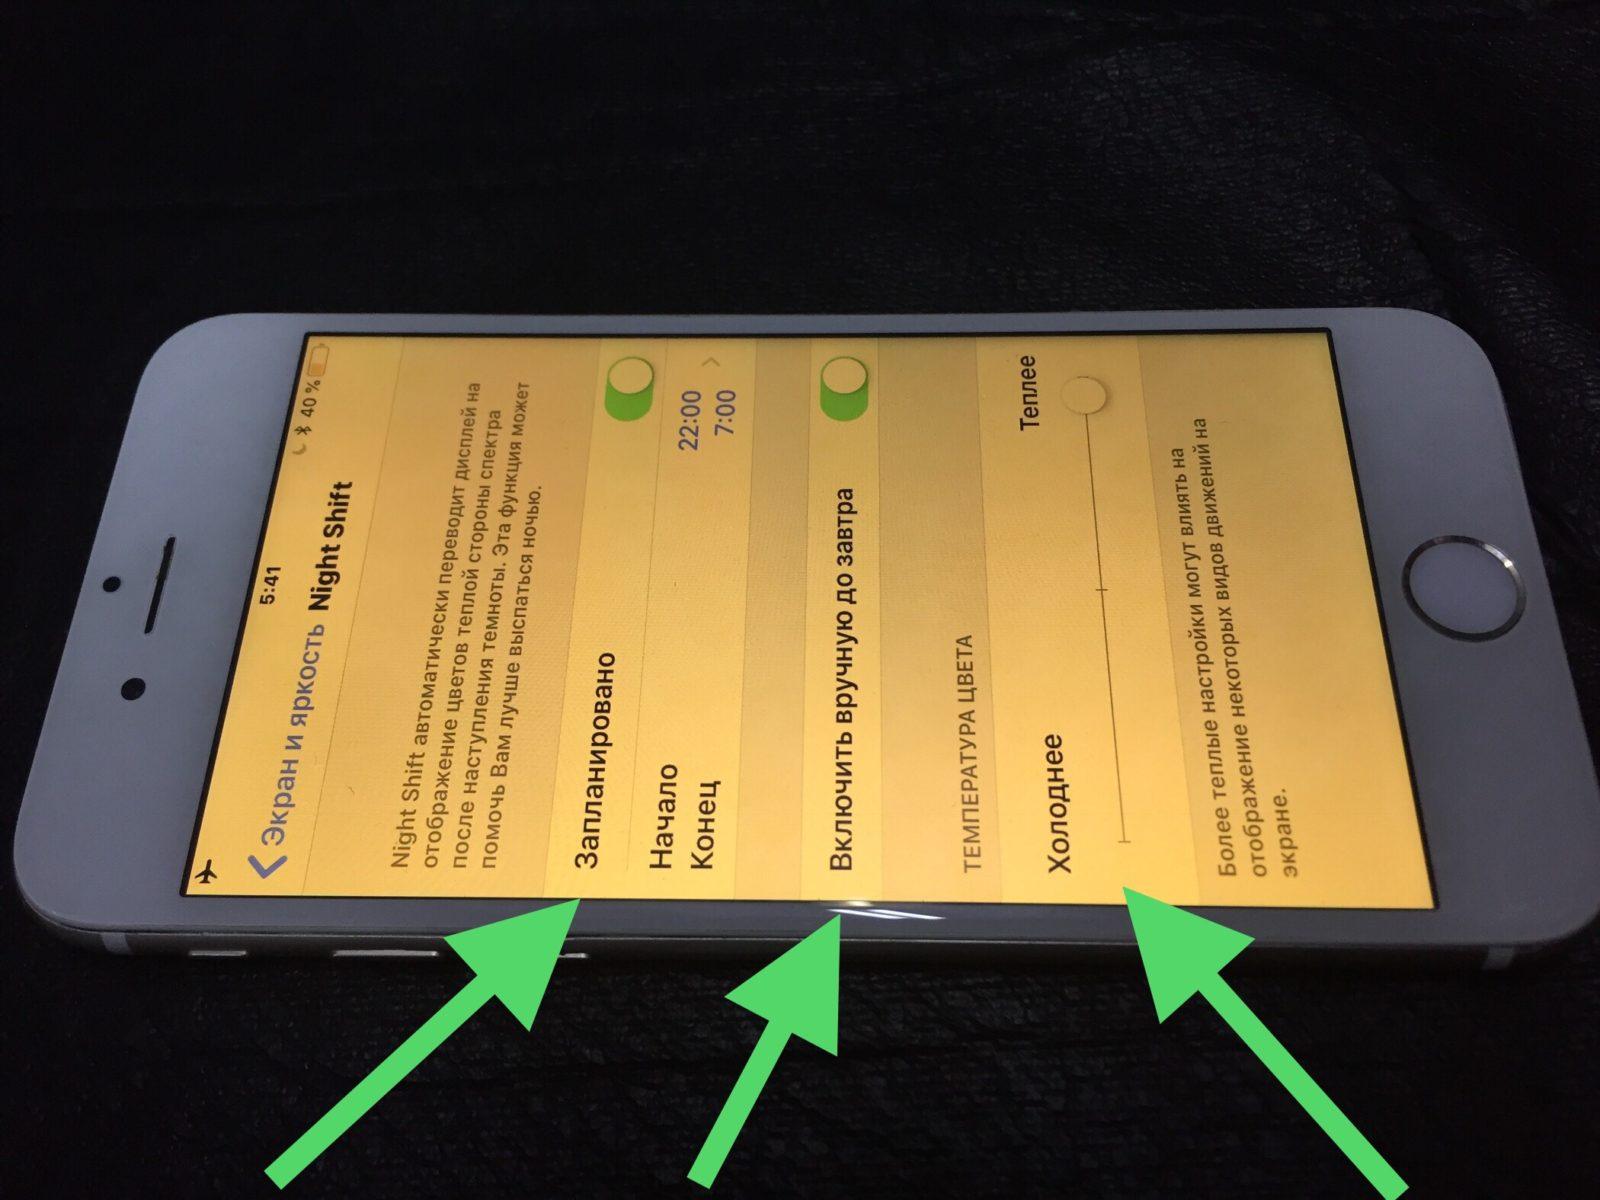 У iPhone изображение желтое или даже красное. Решено